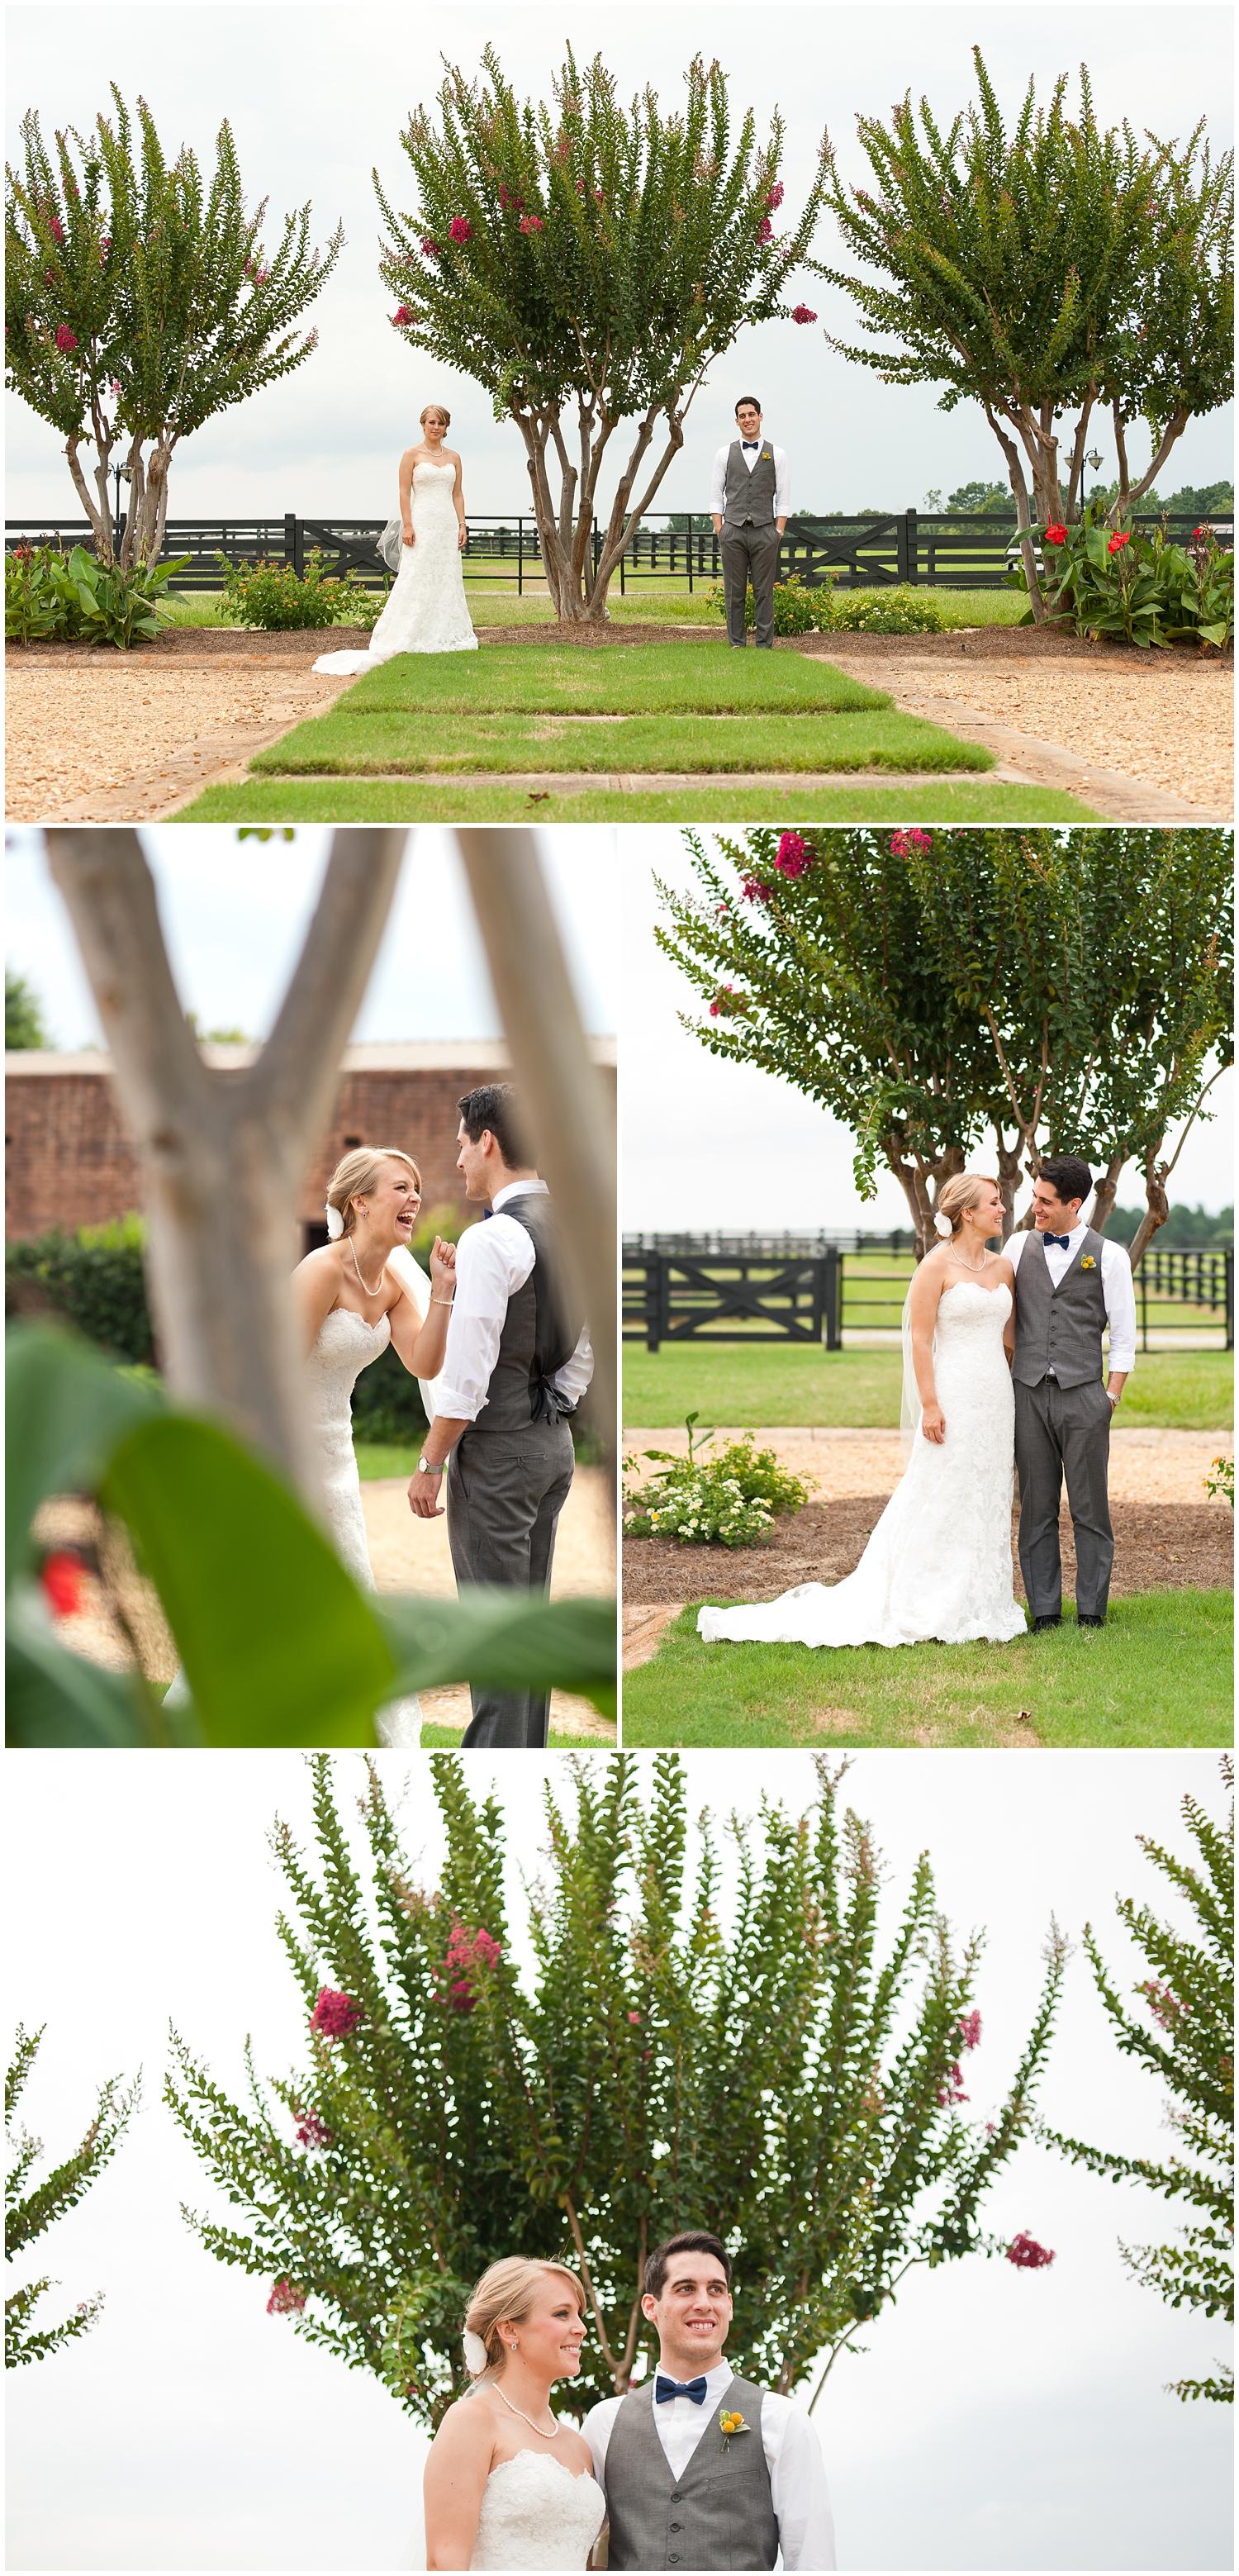 BloomandLo_PeteandAshley_Smithonia_Farm_Wedding_Blog_0014.jpg